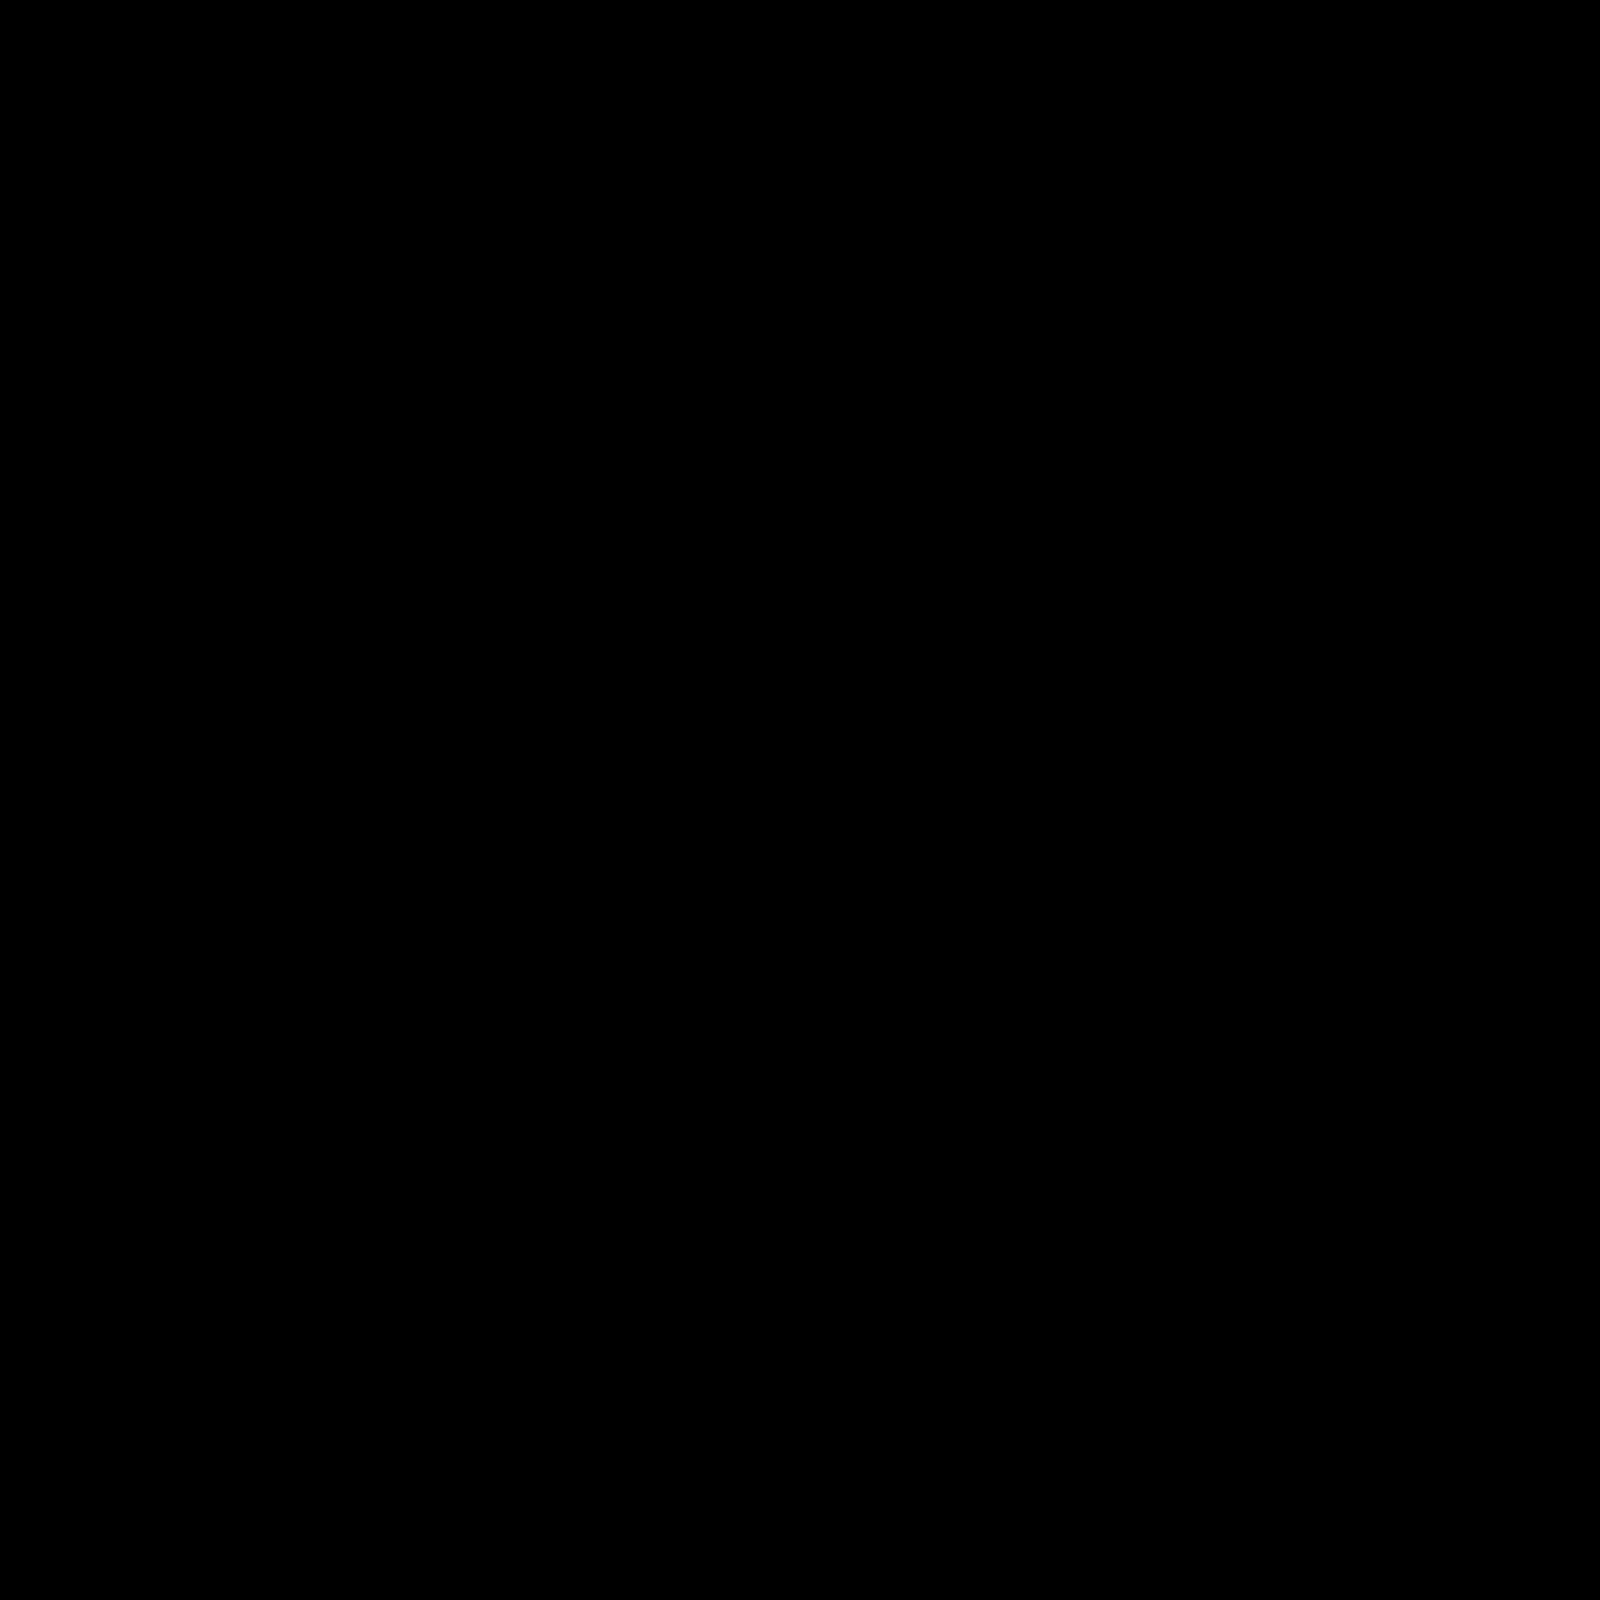 Sheep on Bike Filled icon